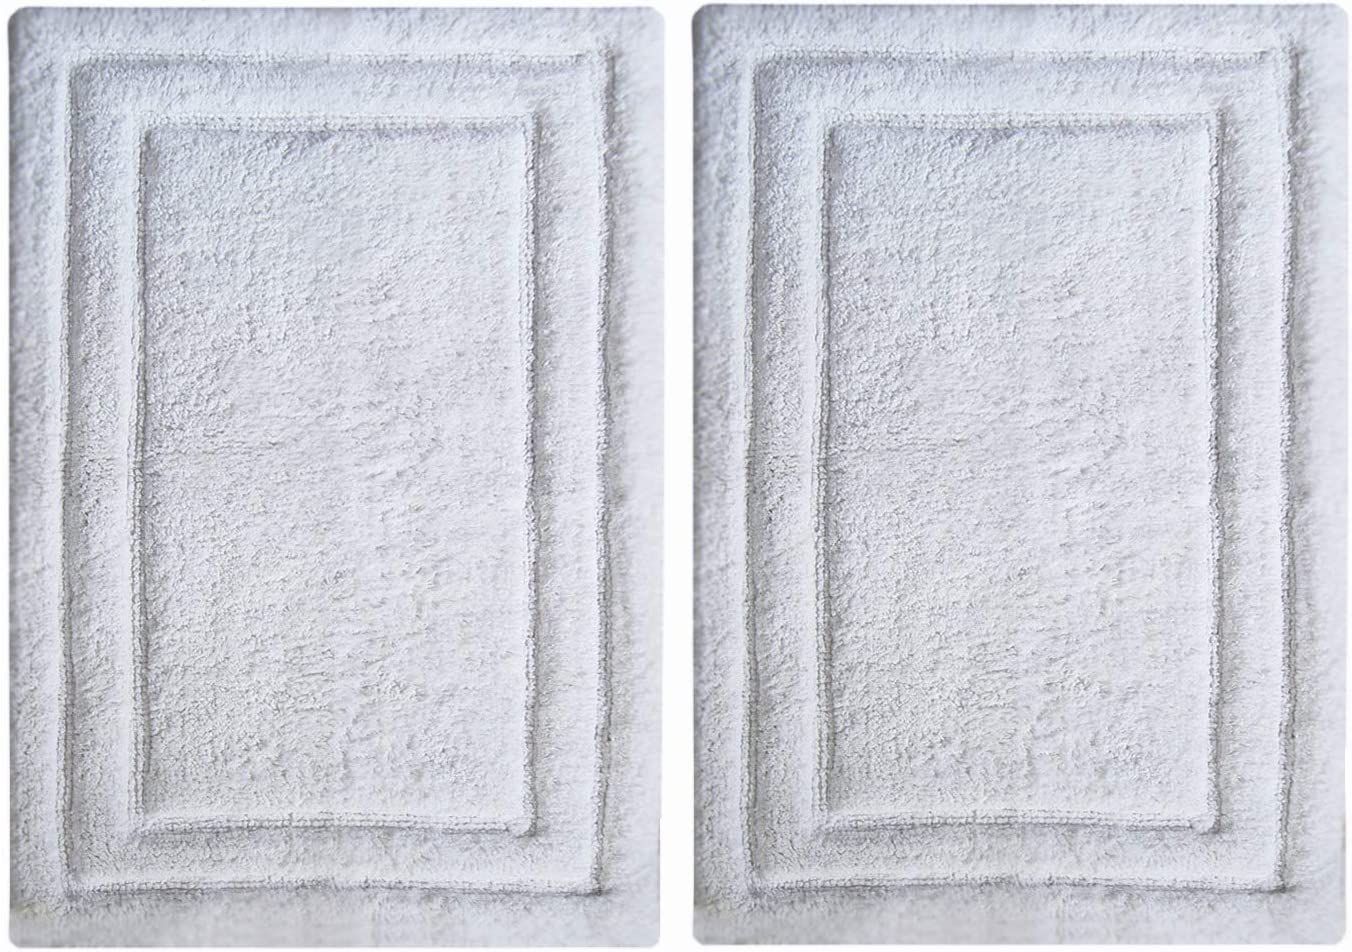 CHARDIN HOME 100% Cotton Bathroom Rugs   Set of 2 Bath mats (17x24/17x24) with Non-Slip Spray Latex (White)